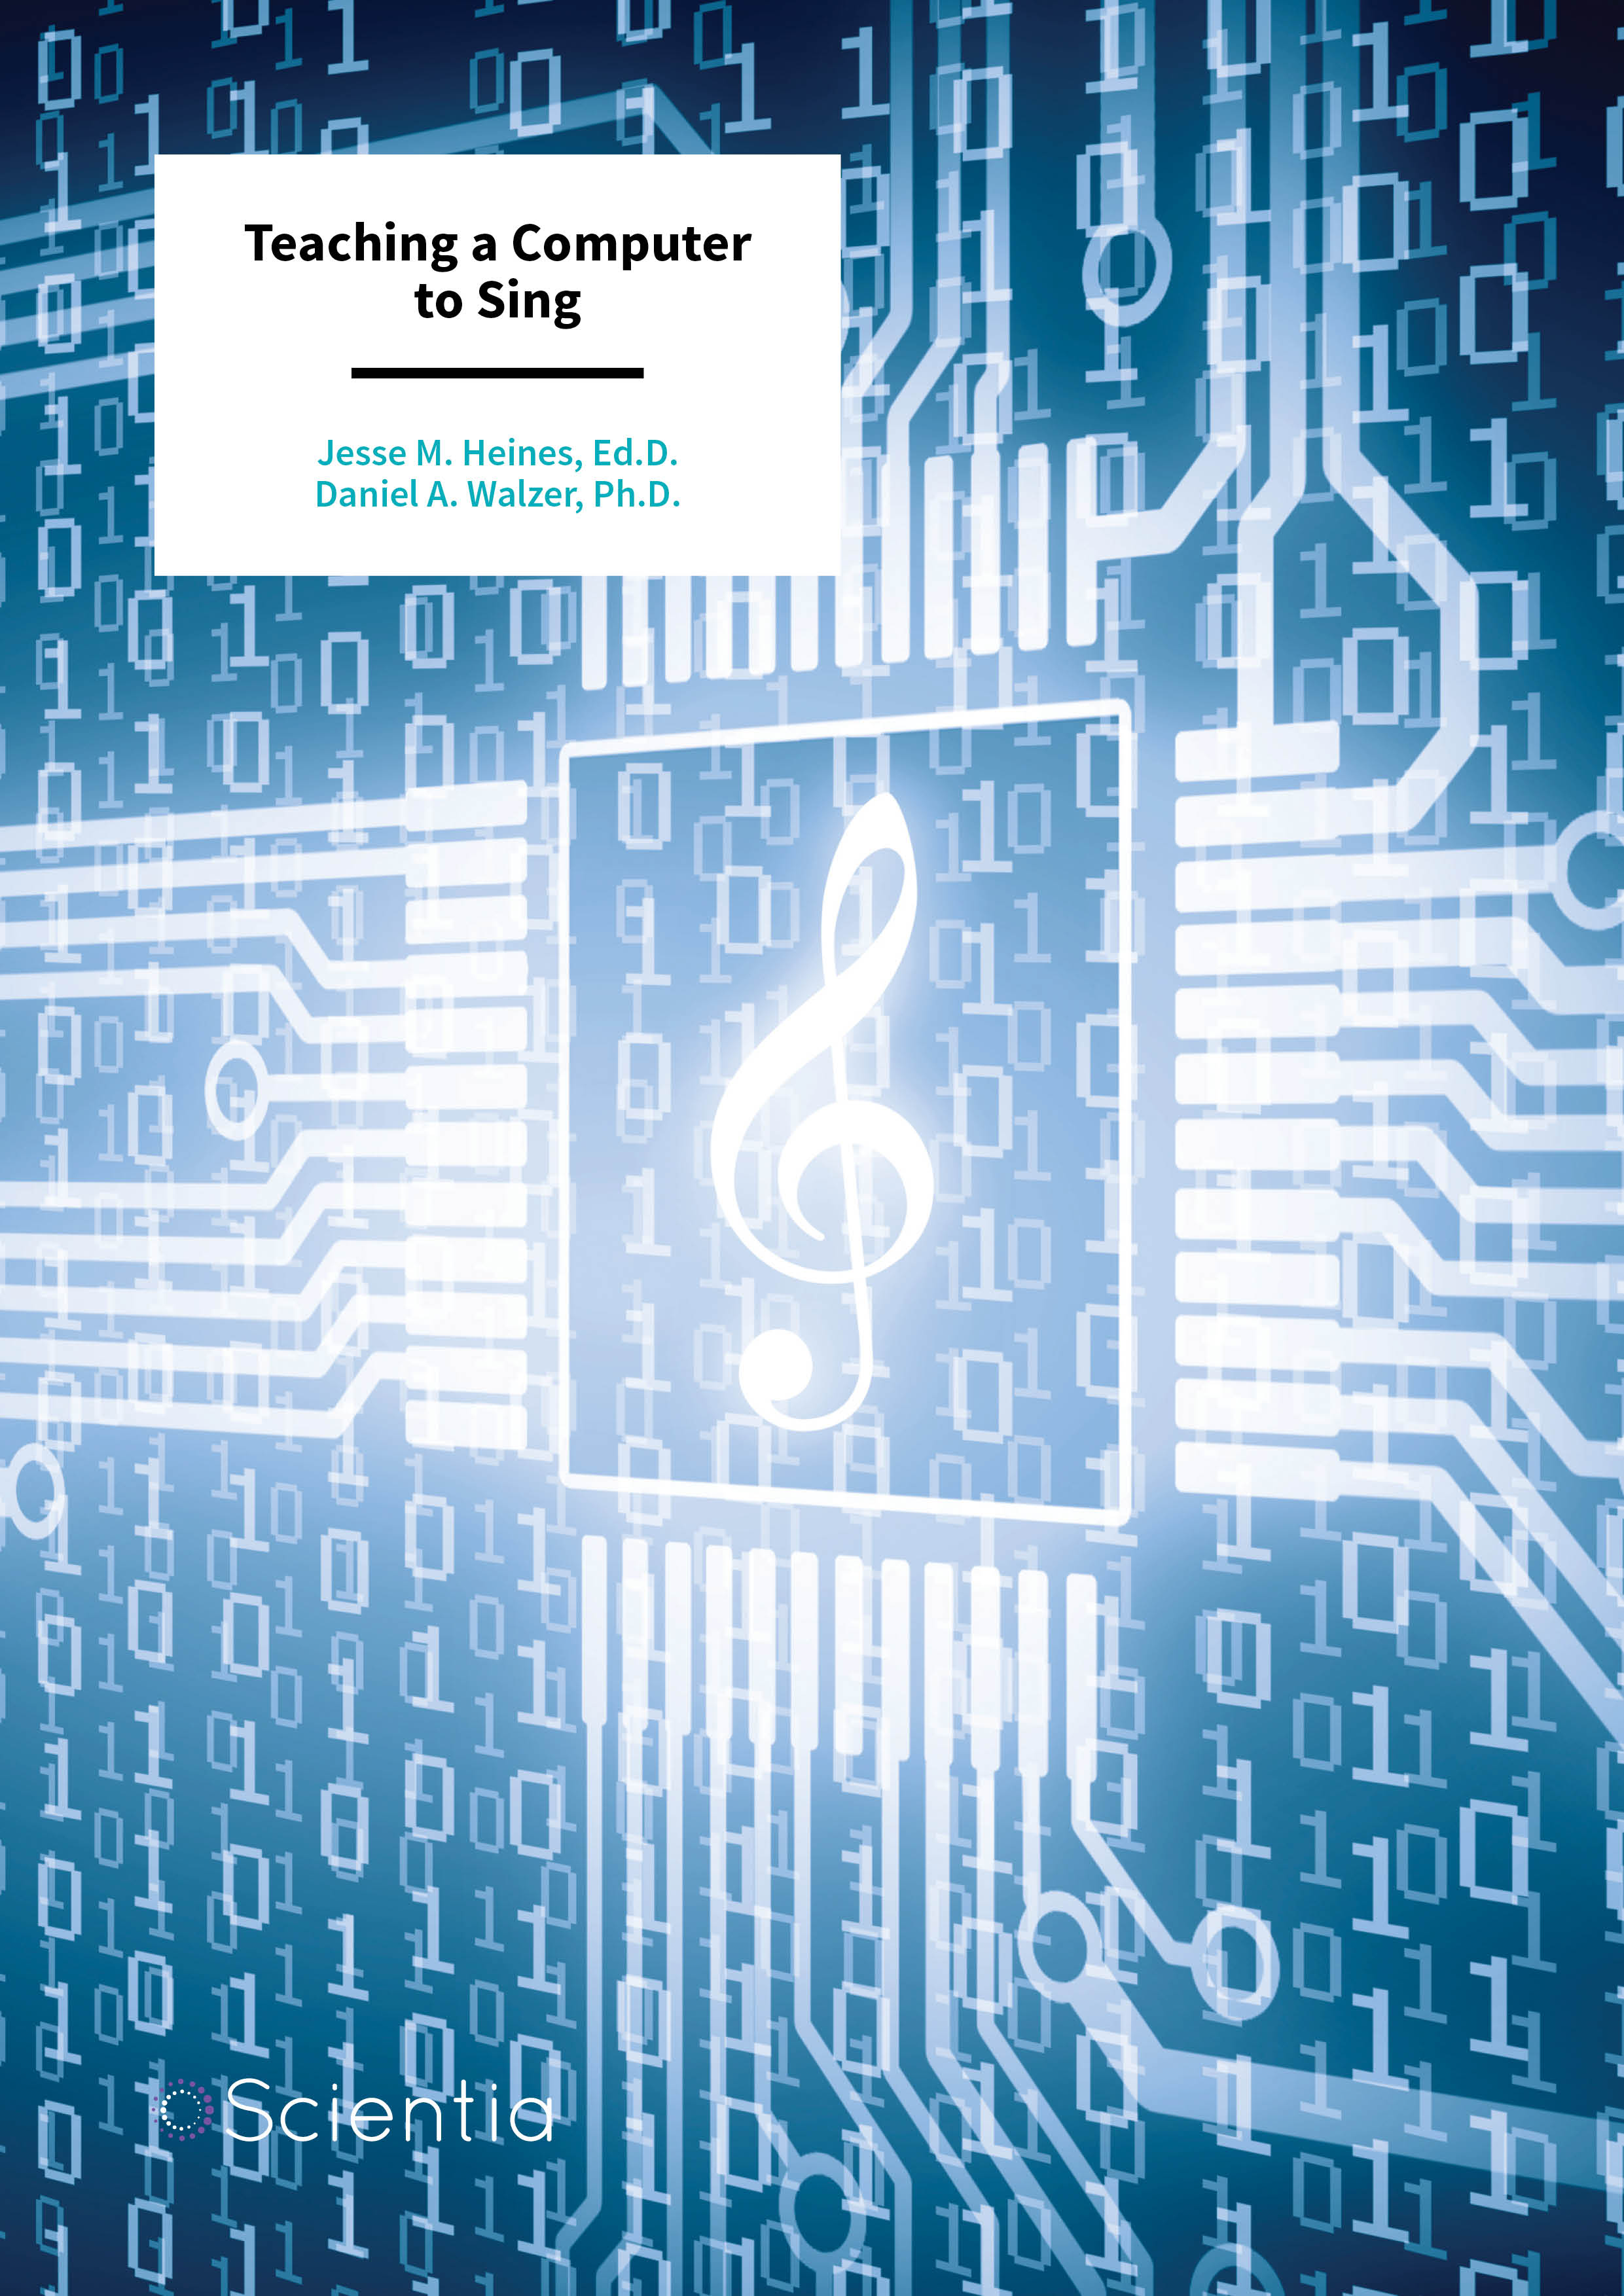 Jesse M. Heines | Daniel A. Walzer – Teaching a Computer to Sing